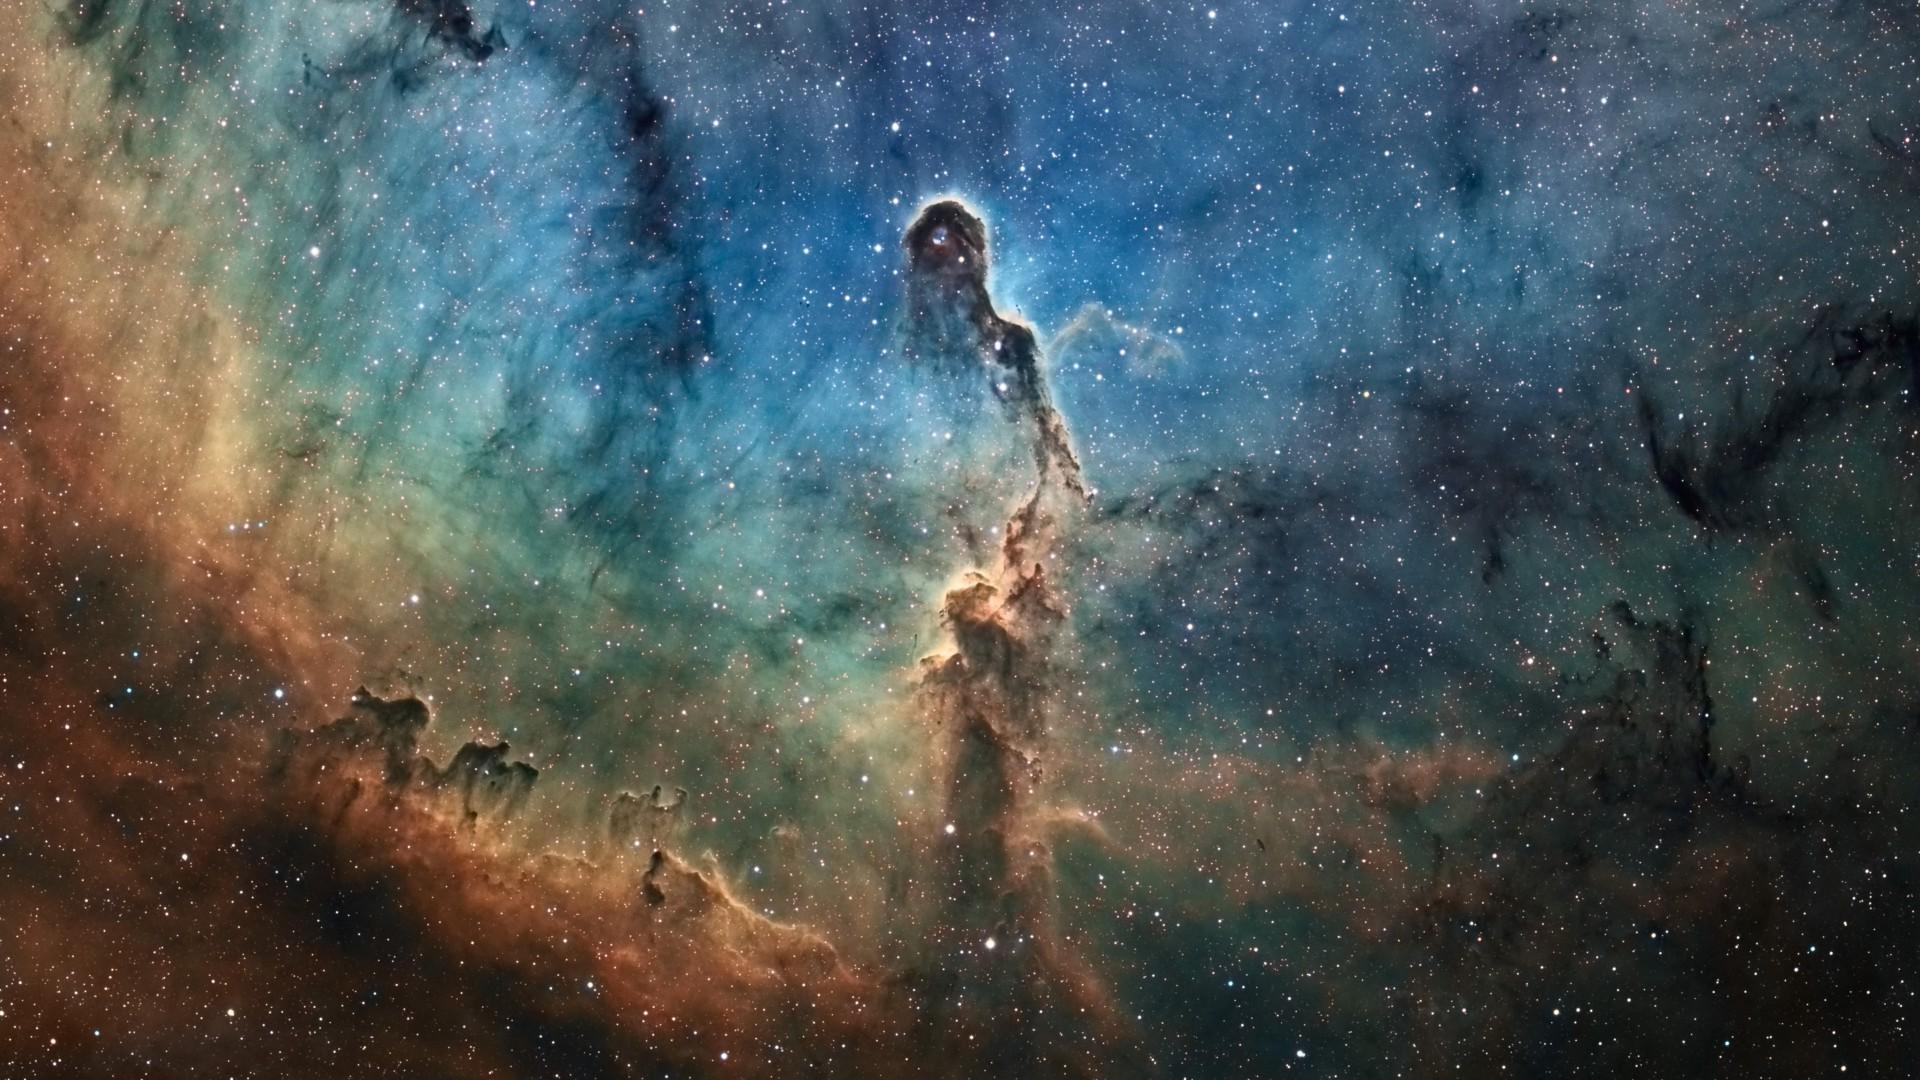 Gravity Falls Wallpapers Hd 1080p Wallpaper 1920x1080 Px Galaxy Nasa Space 1920x1080